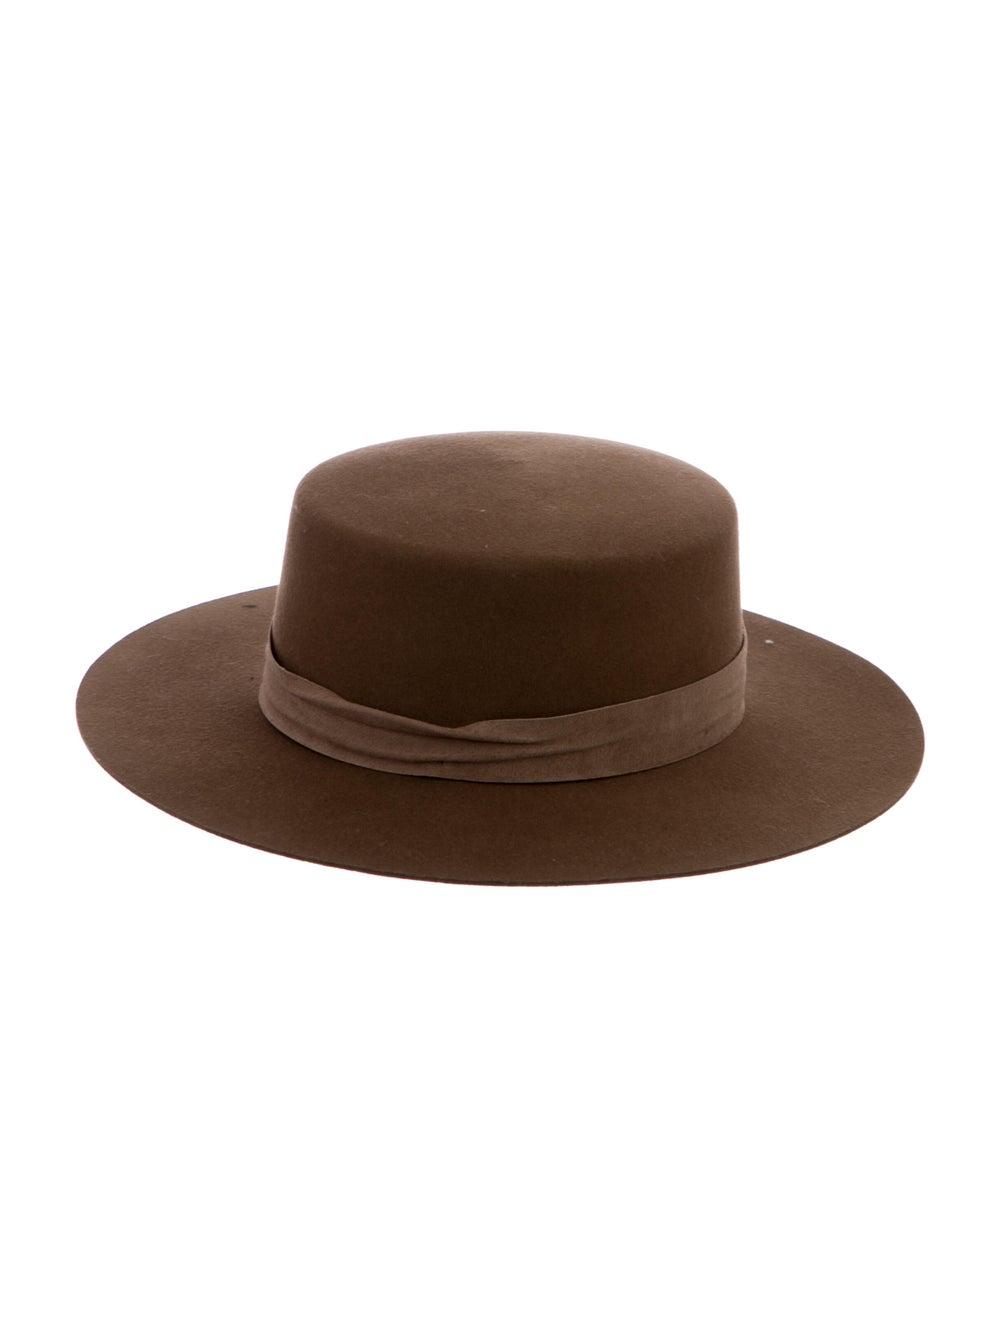 Janessa Leone Fur Felt Fedora Hat Tan - image 1